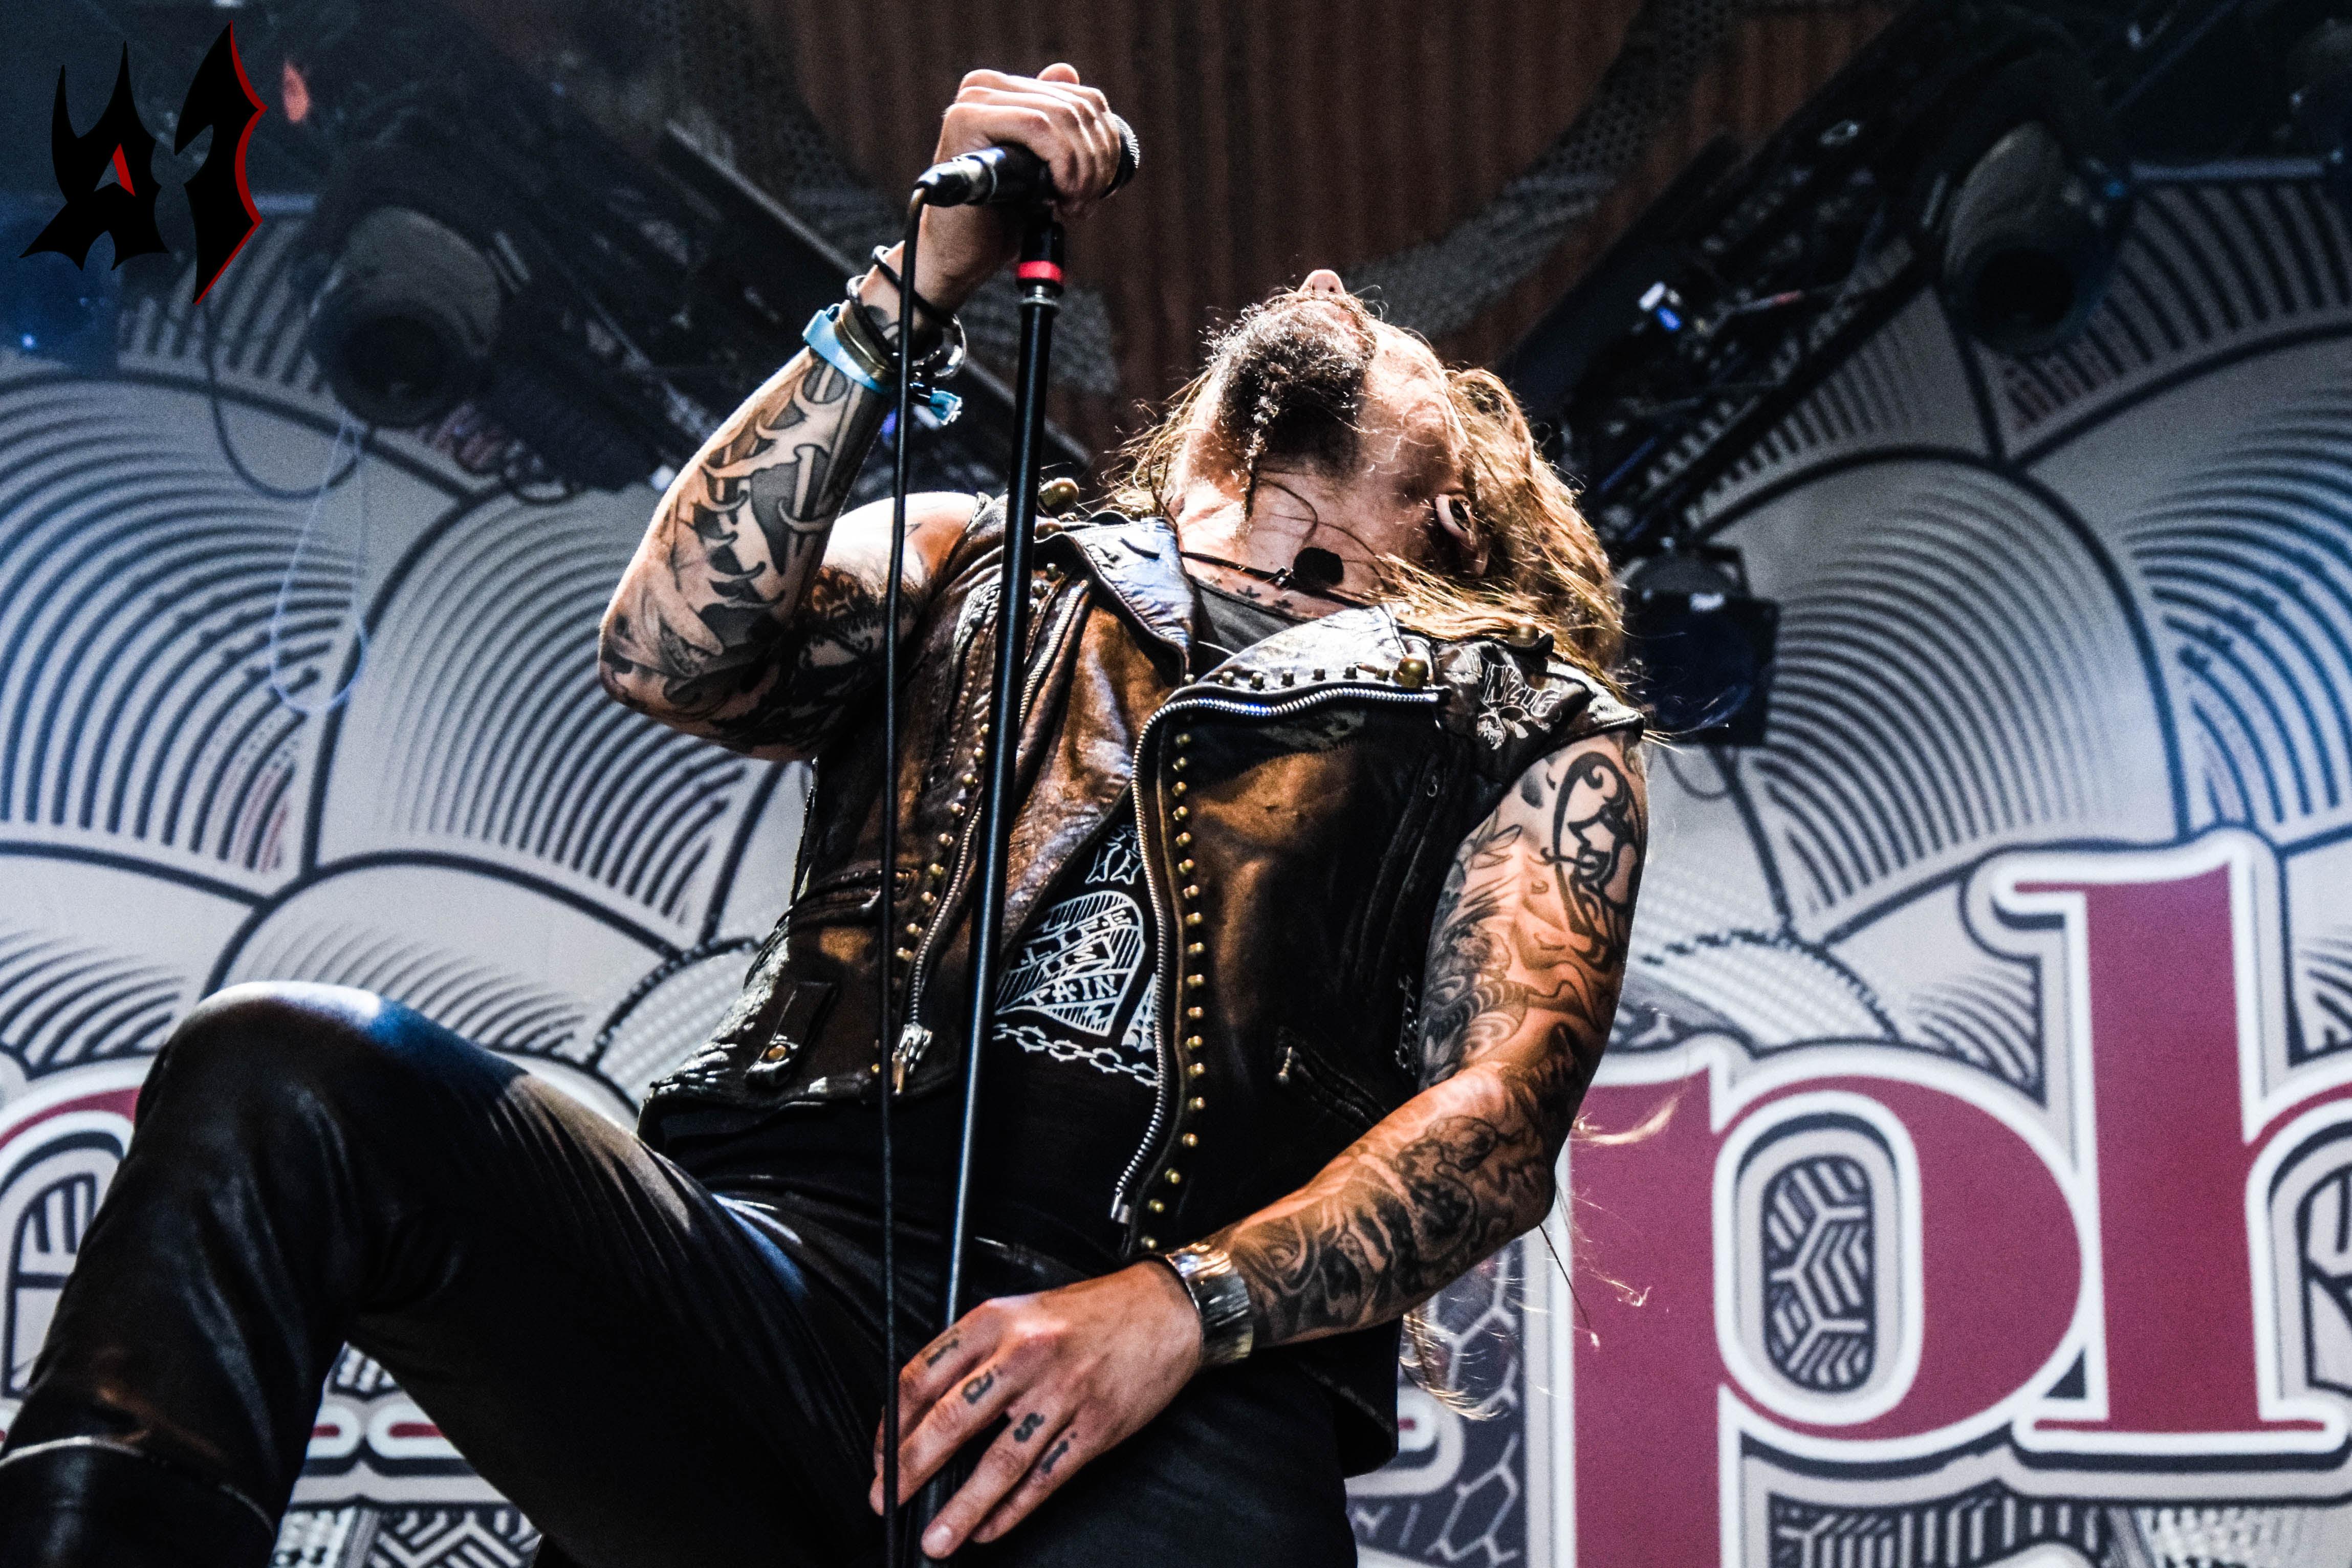 Hellfest 2018 – Day 3 - Amorphis 23